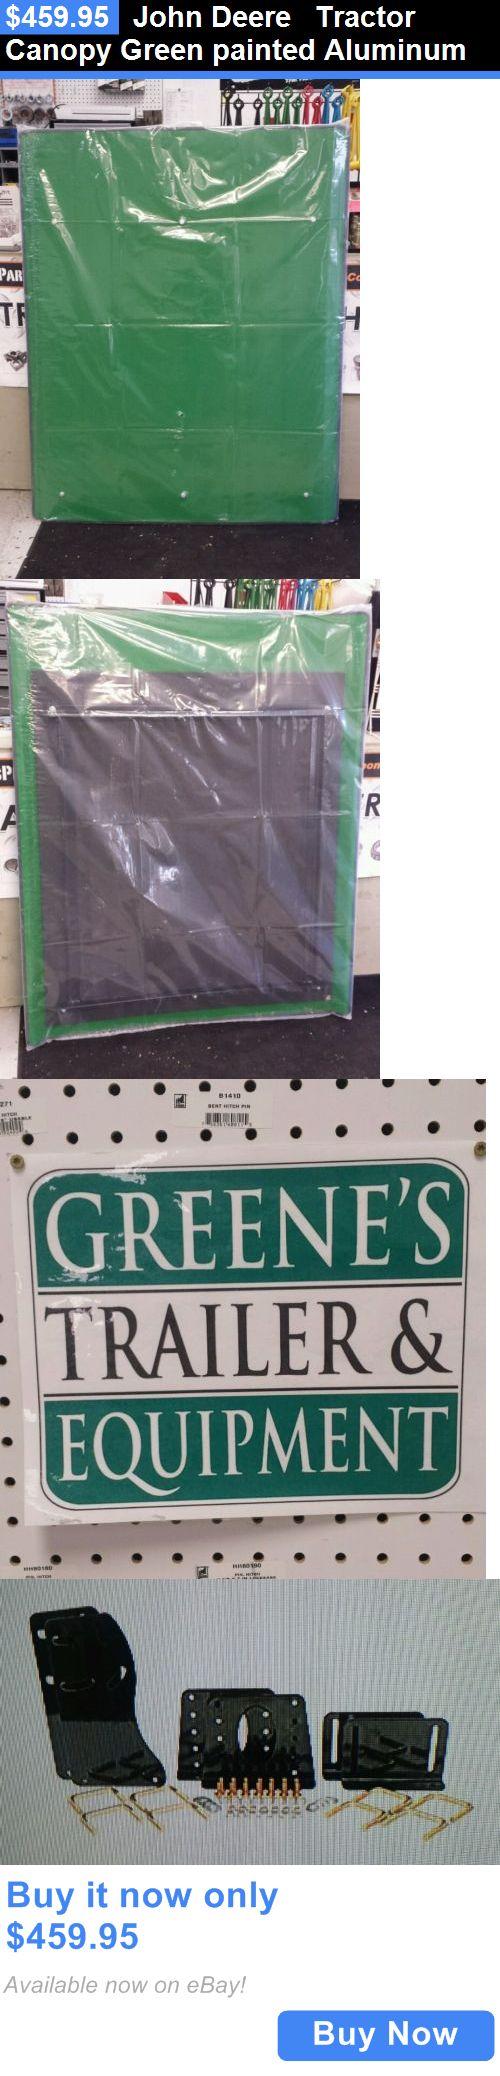 heavy equipment: John Deere Tractor Canopy Green Painted Aluminum BUY IT NOW ONLY: $459.95